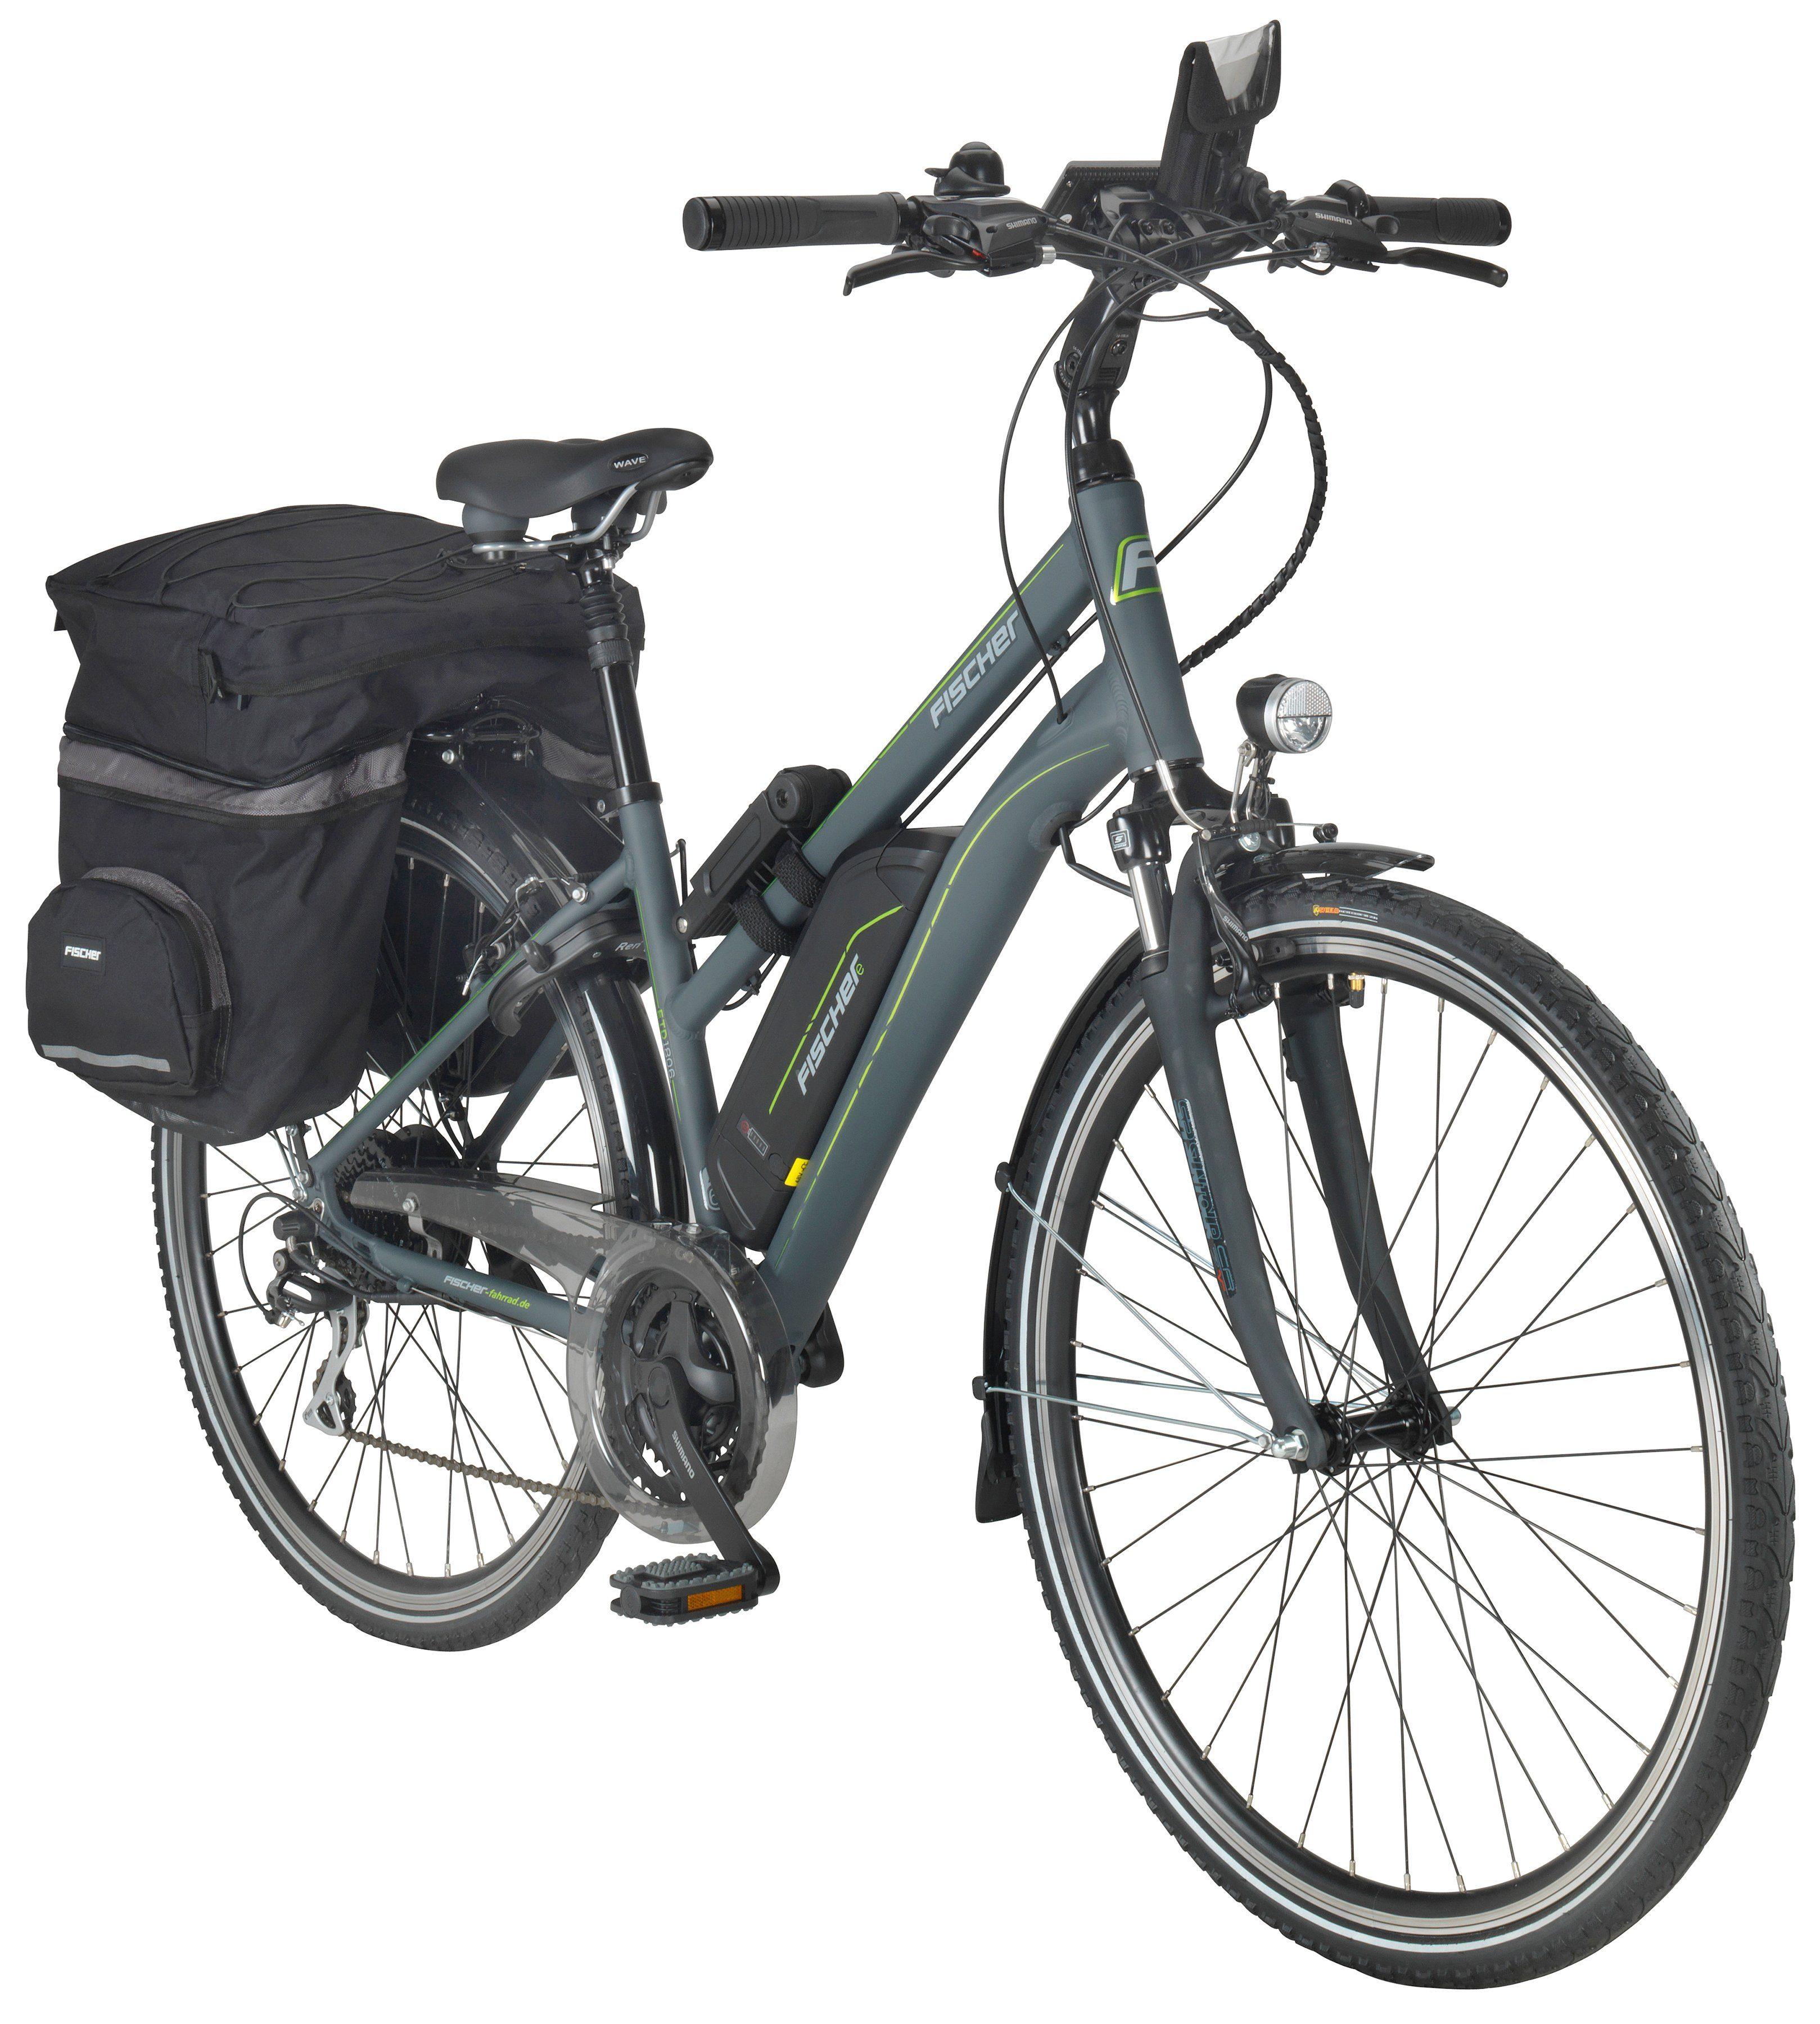 FISCHER FAHRRAEDER E-Bike Trekking Damen »ETD1806«, 71,12 cm (28 Zoll), 24 Gänge, 422 Wh, Heckmotor